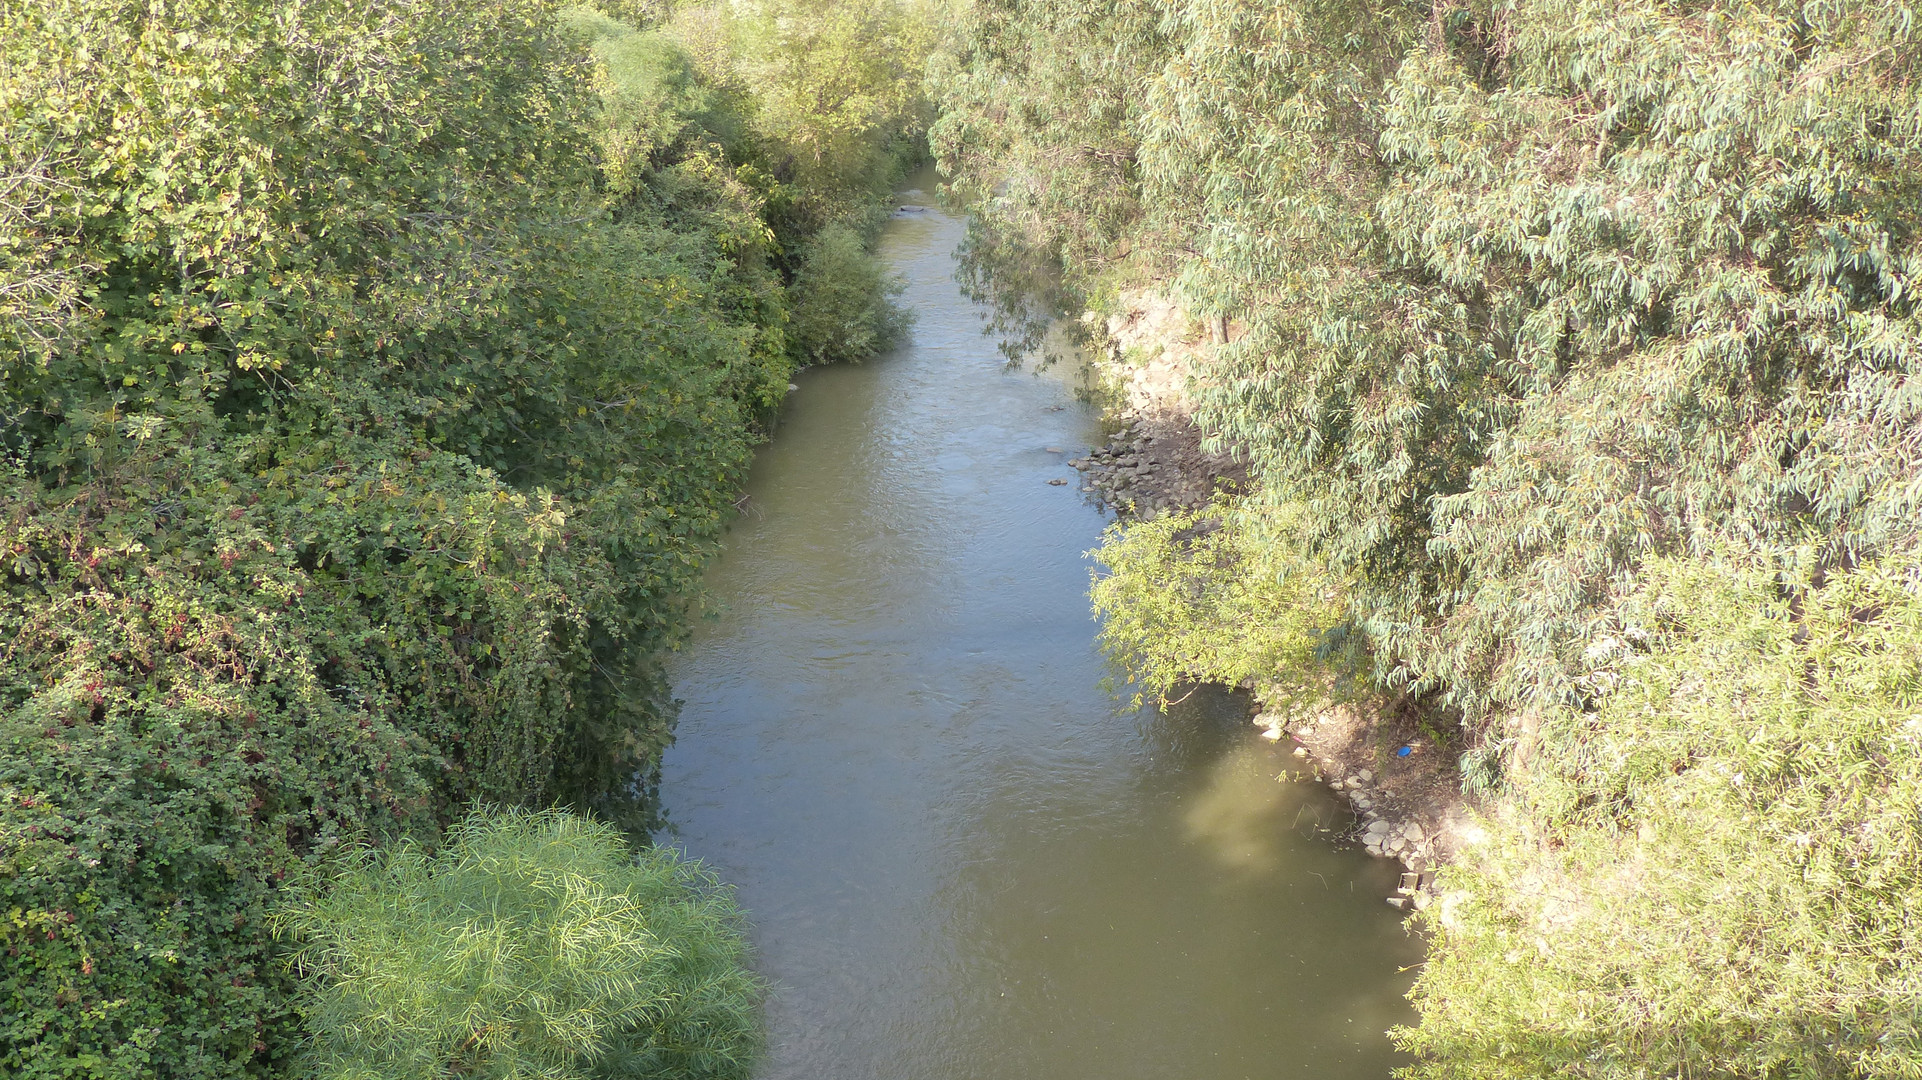 Jordan River by Viewing Area 6e